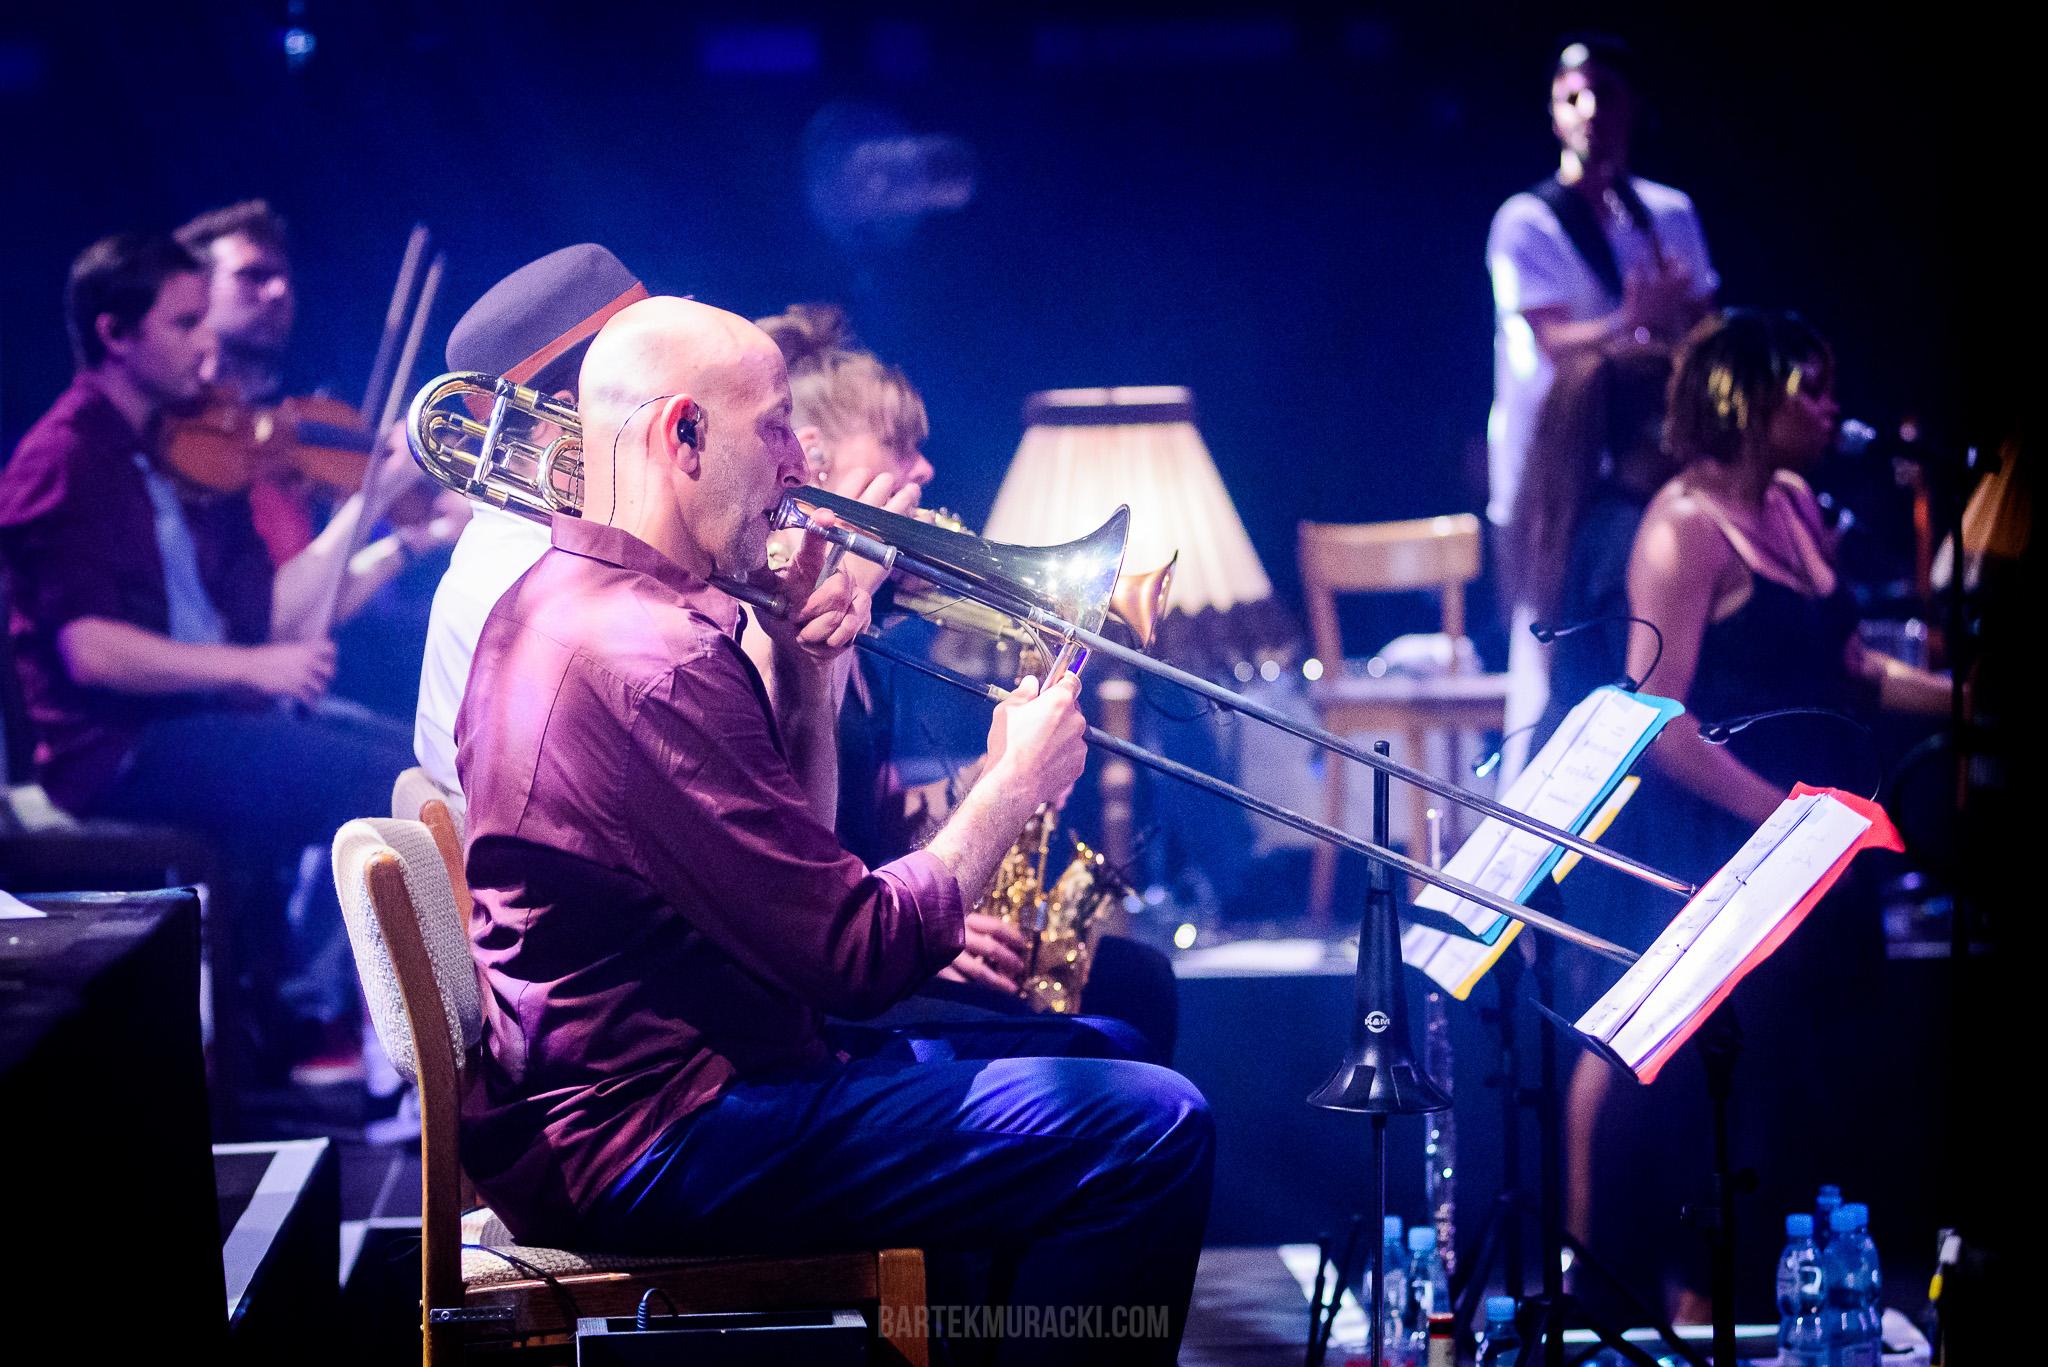 Gentleman-MTV-Unplugged-Spotkania-Kultur-fot-Bartek-Muracki-25-2359